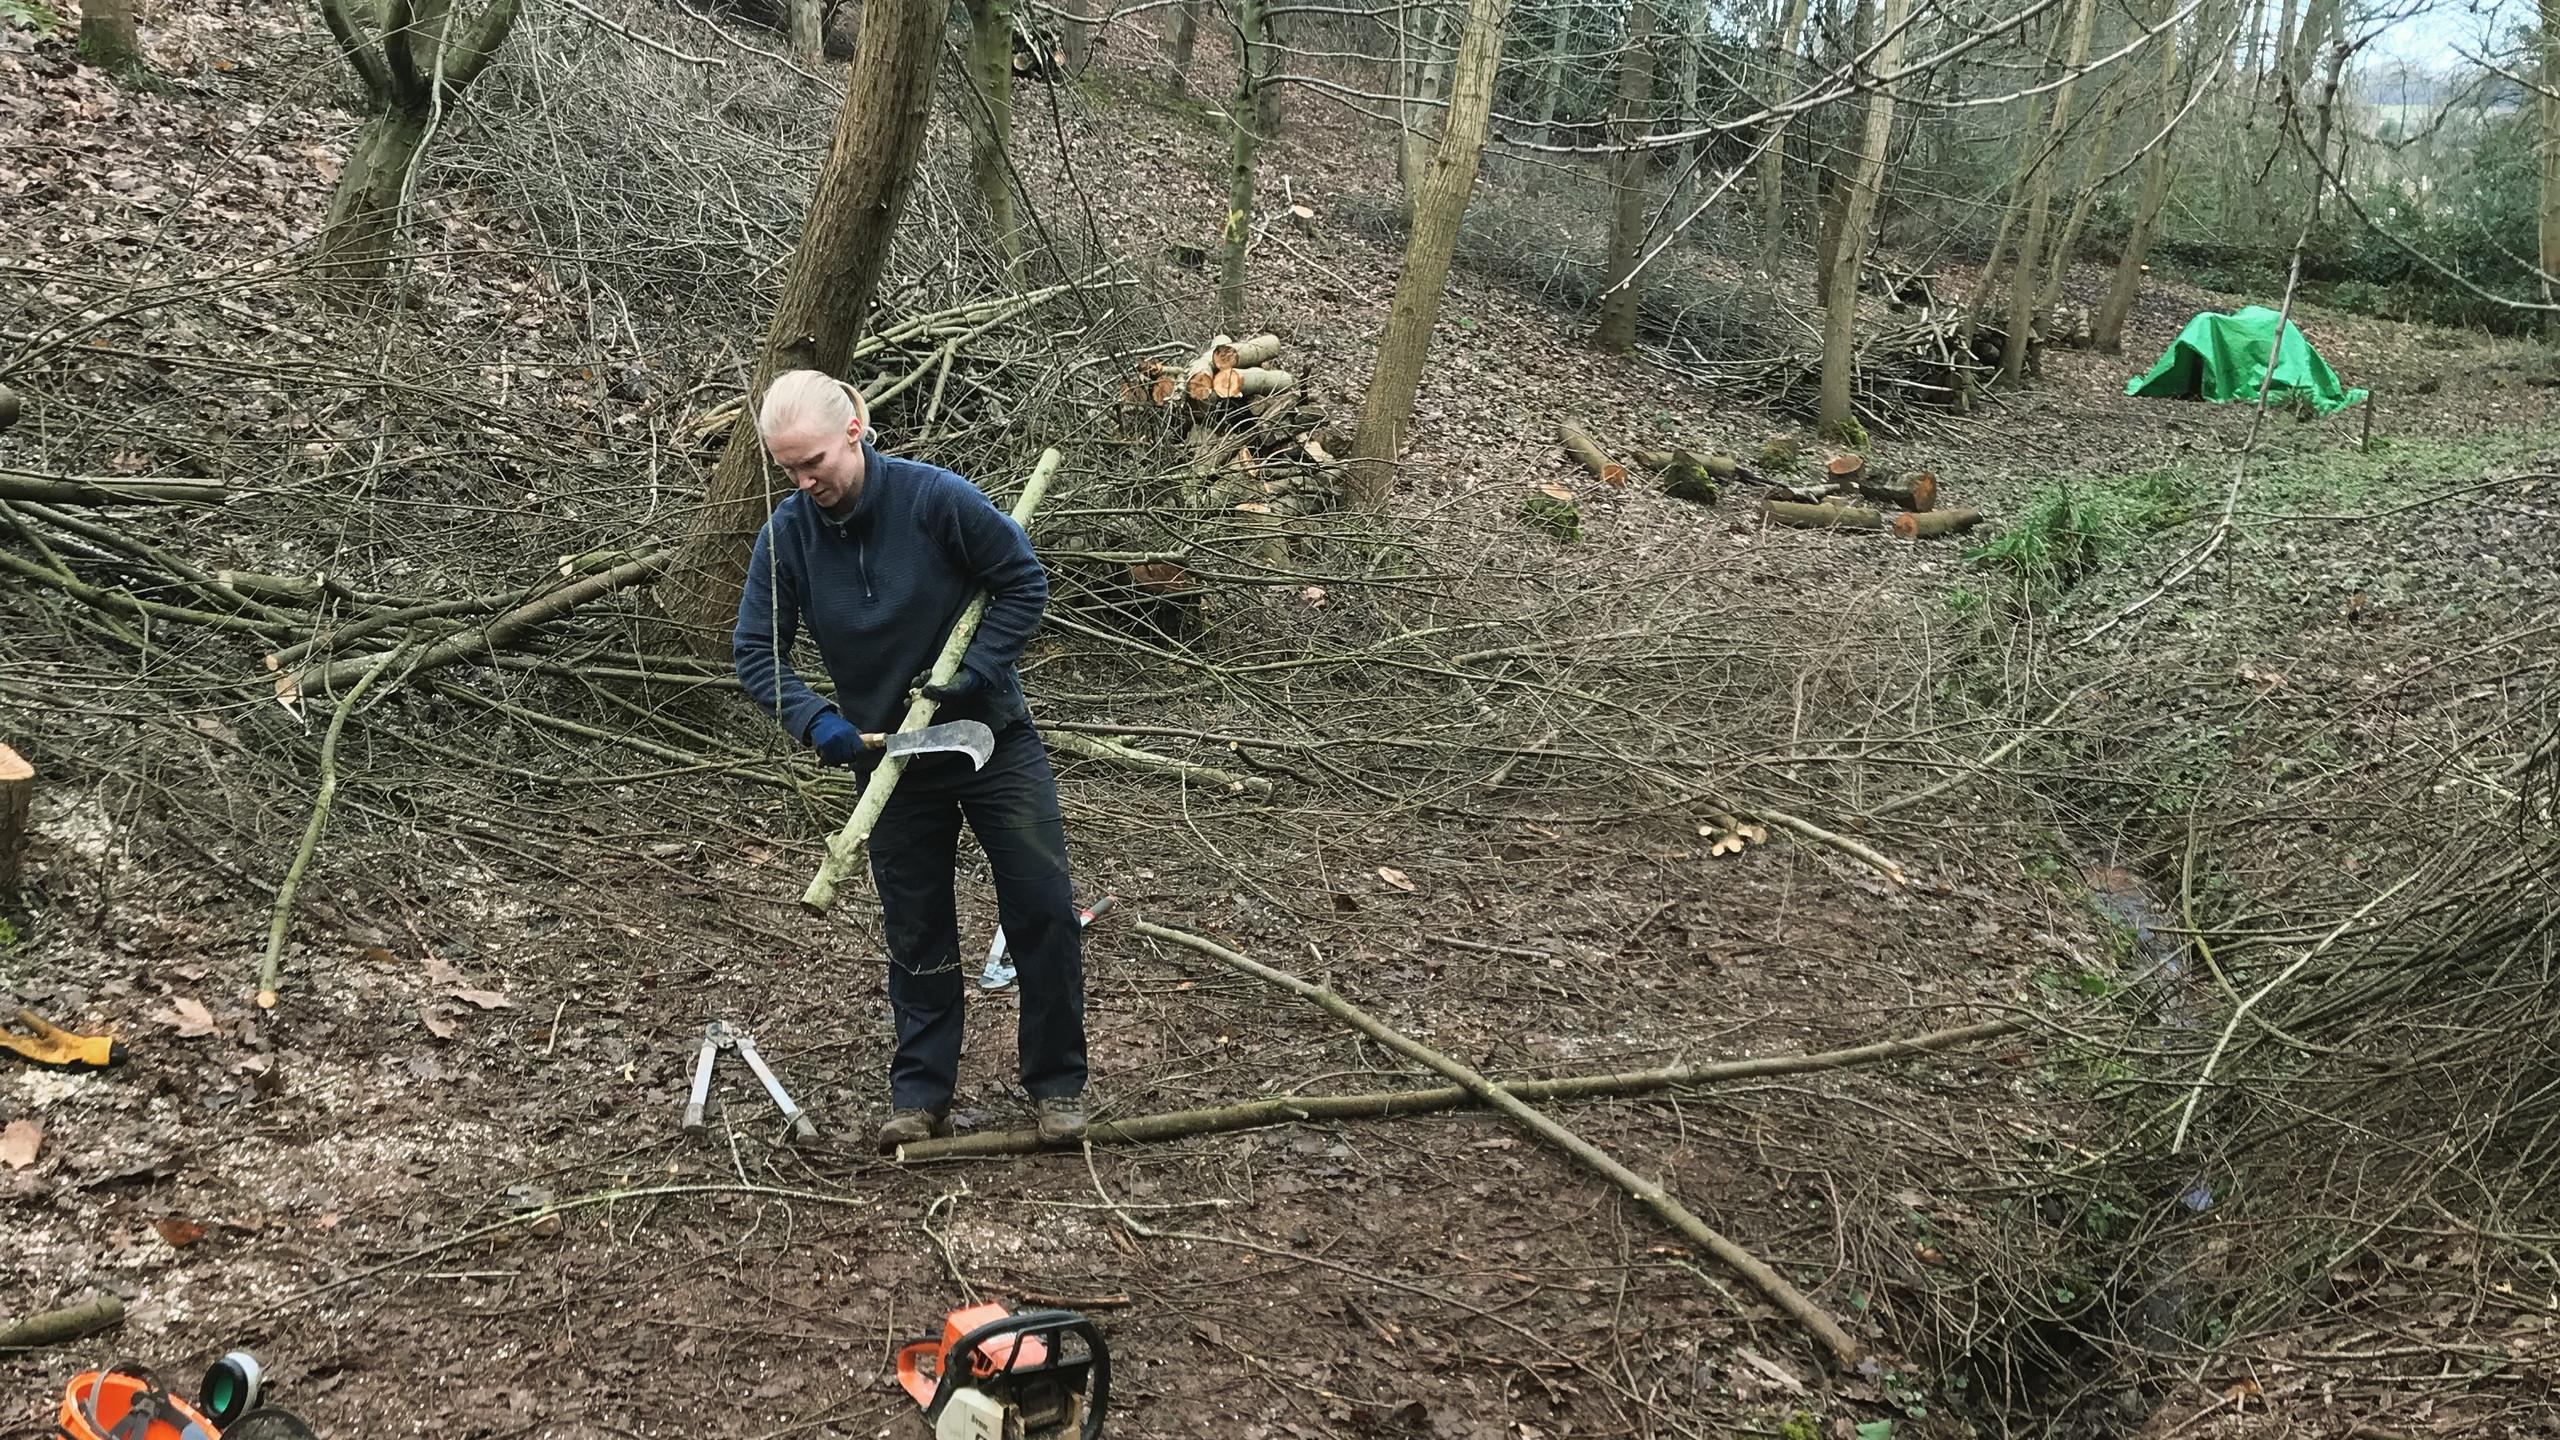 Preparing brash/poles/logs